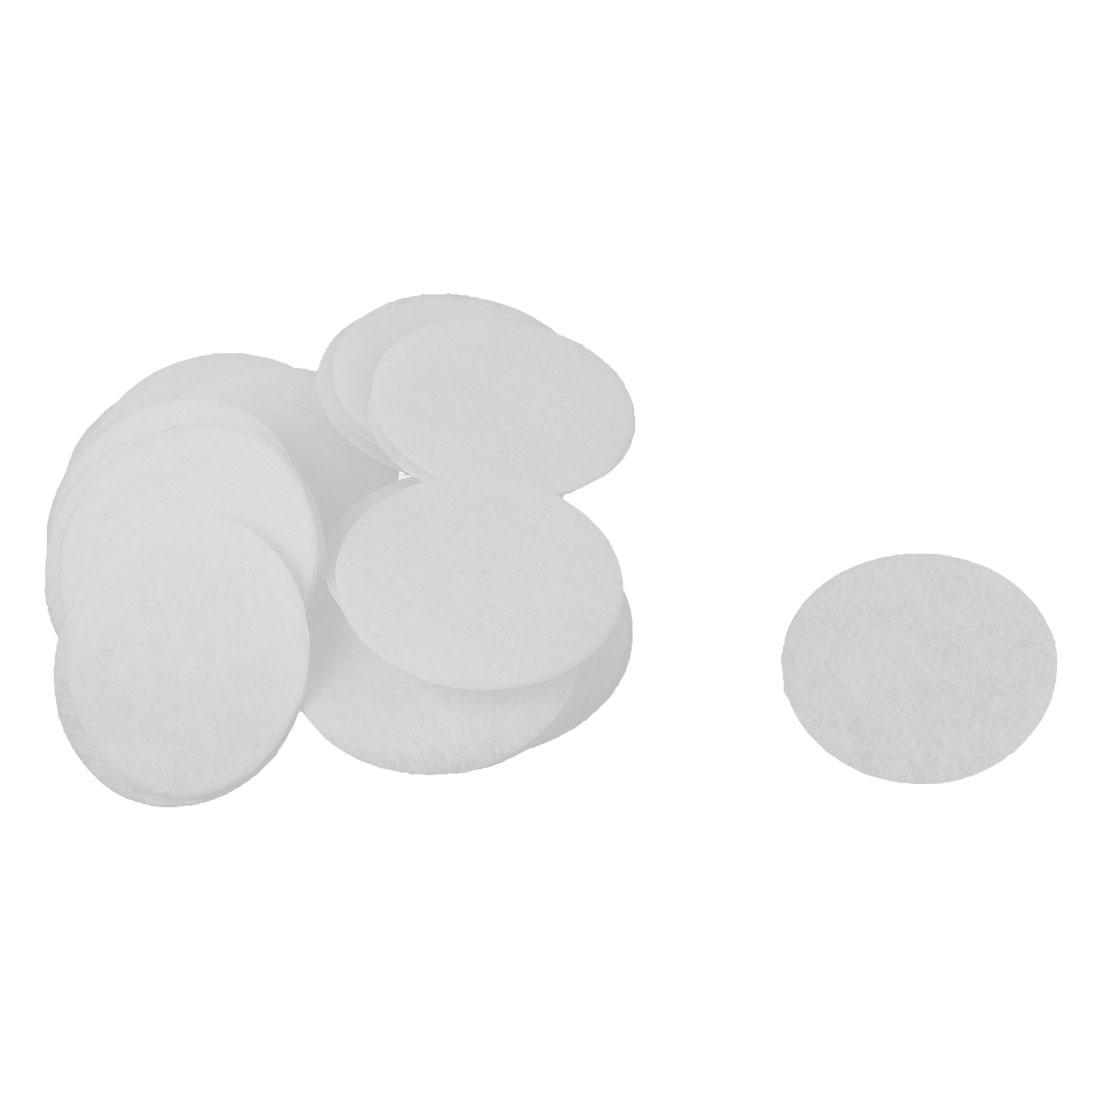 DIY Craft Accessories Hair Band Hairband Circle Pad White 40mm Diameter 40pcs